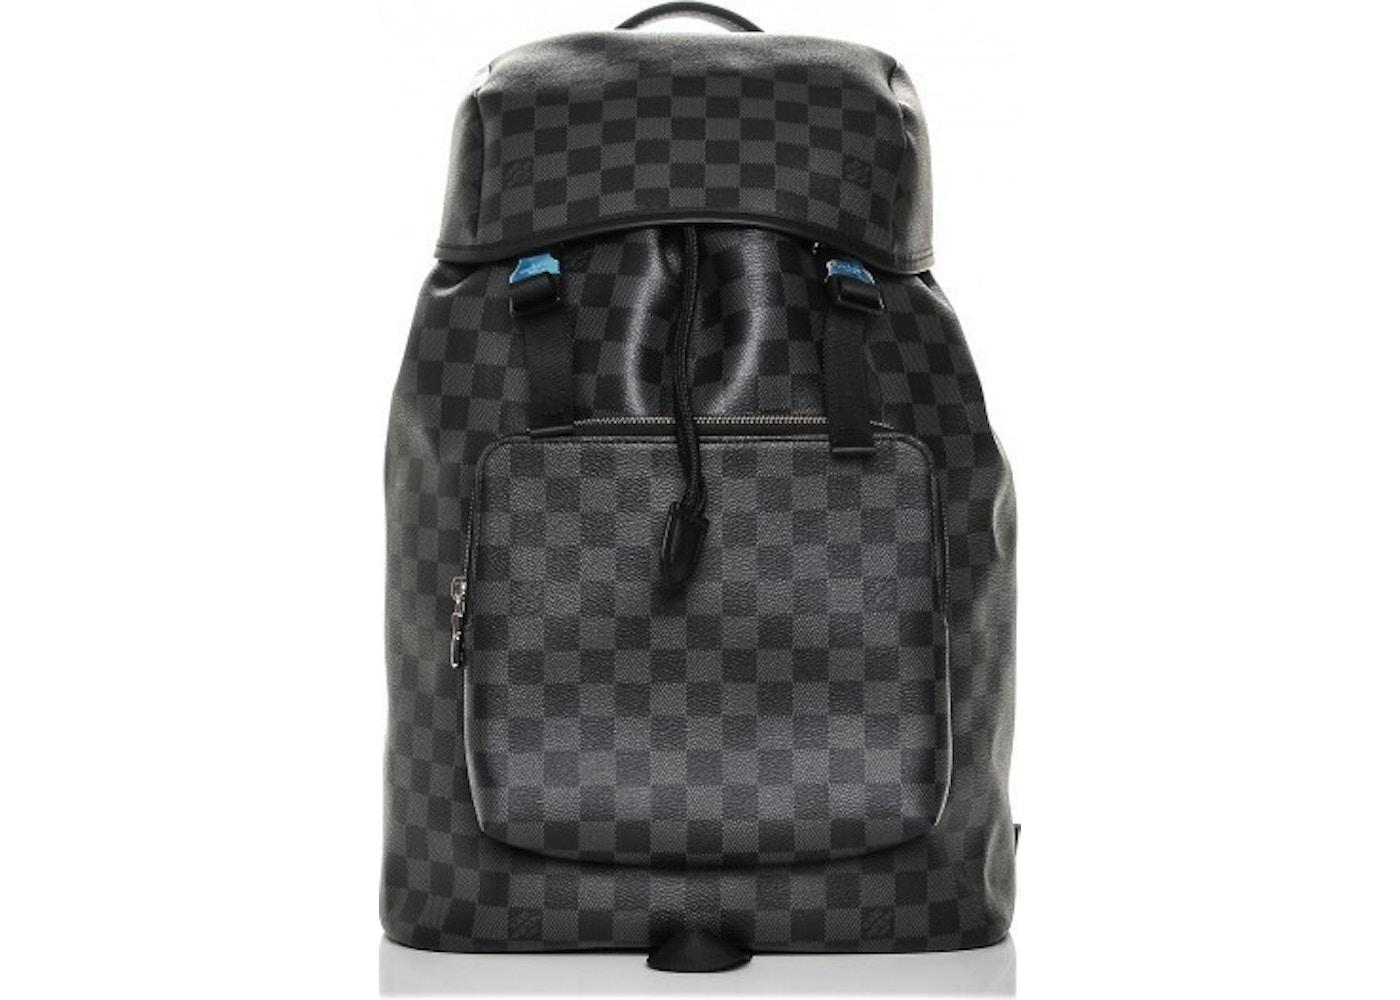 098c82cbceb5 Louis Vuitton Backpack Zack Damier Graphite Black